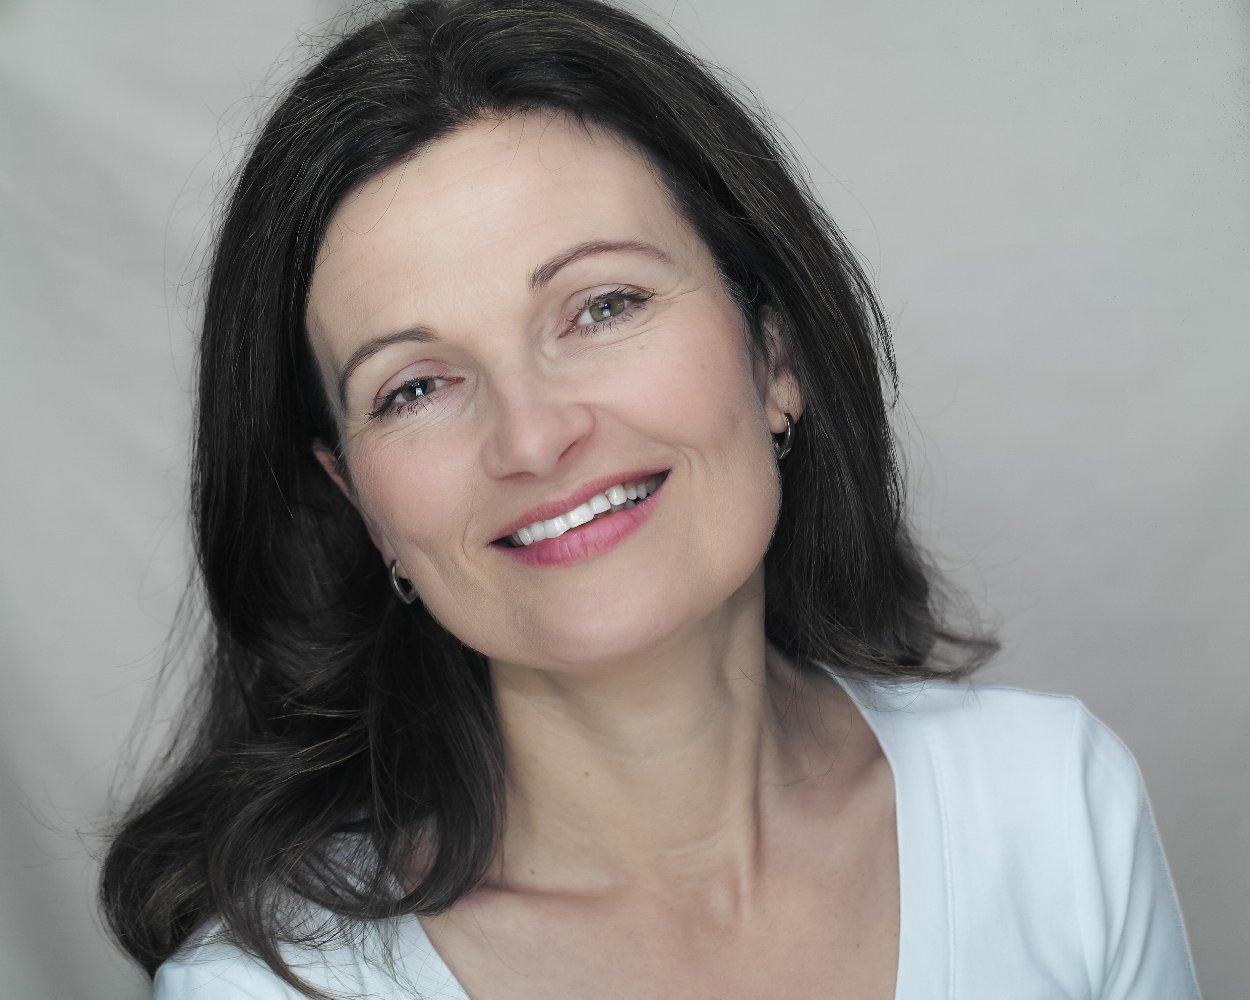 Helen Coverdale